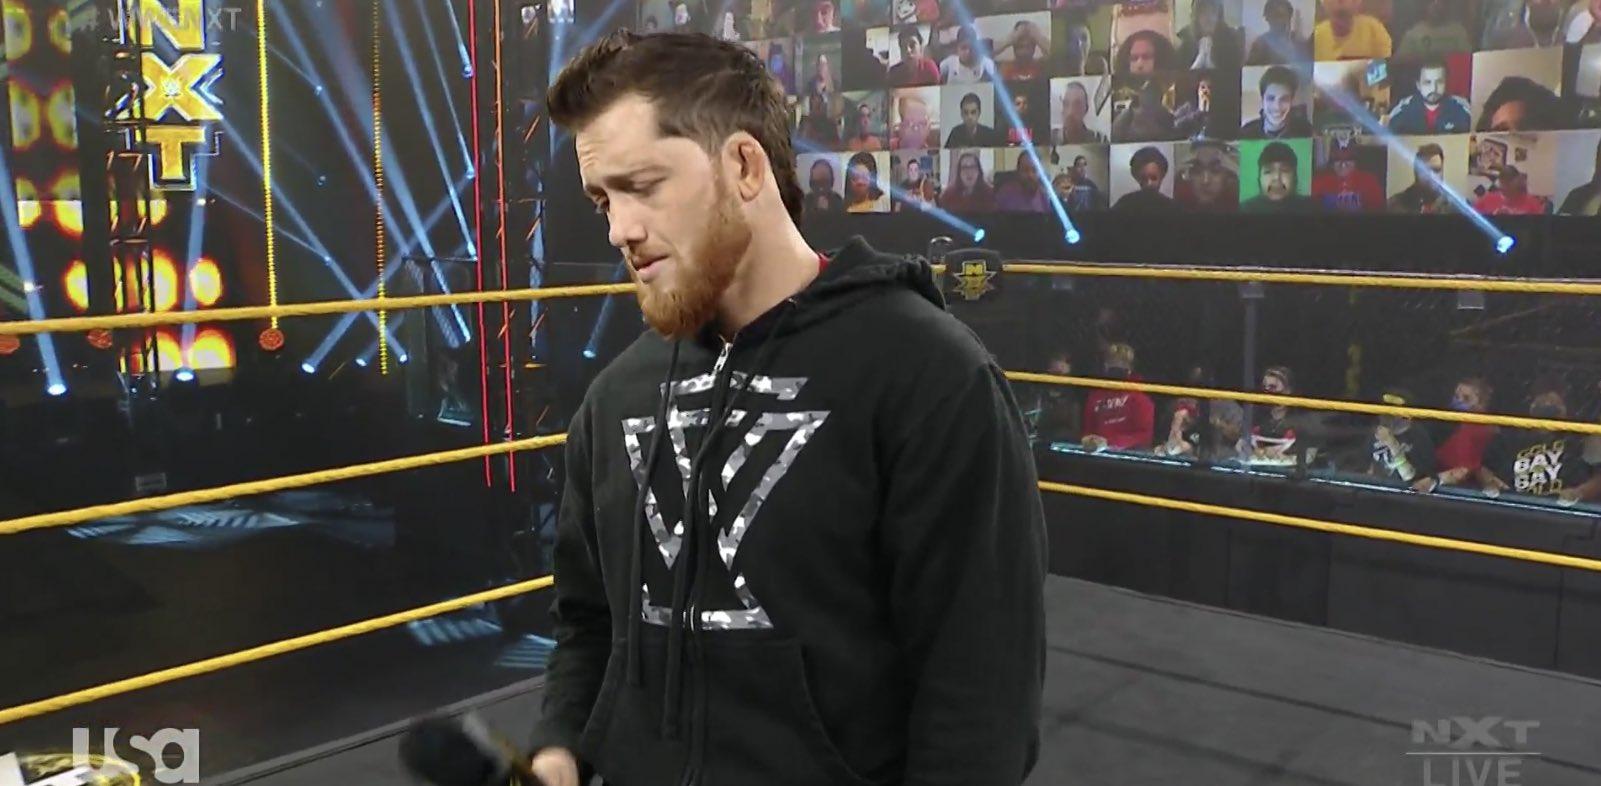 Kyle O'Reilly - NXT February 17, 2021